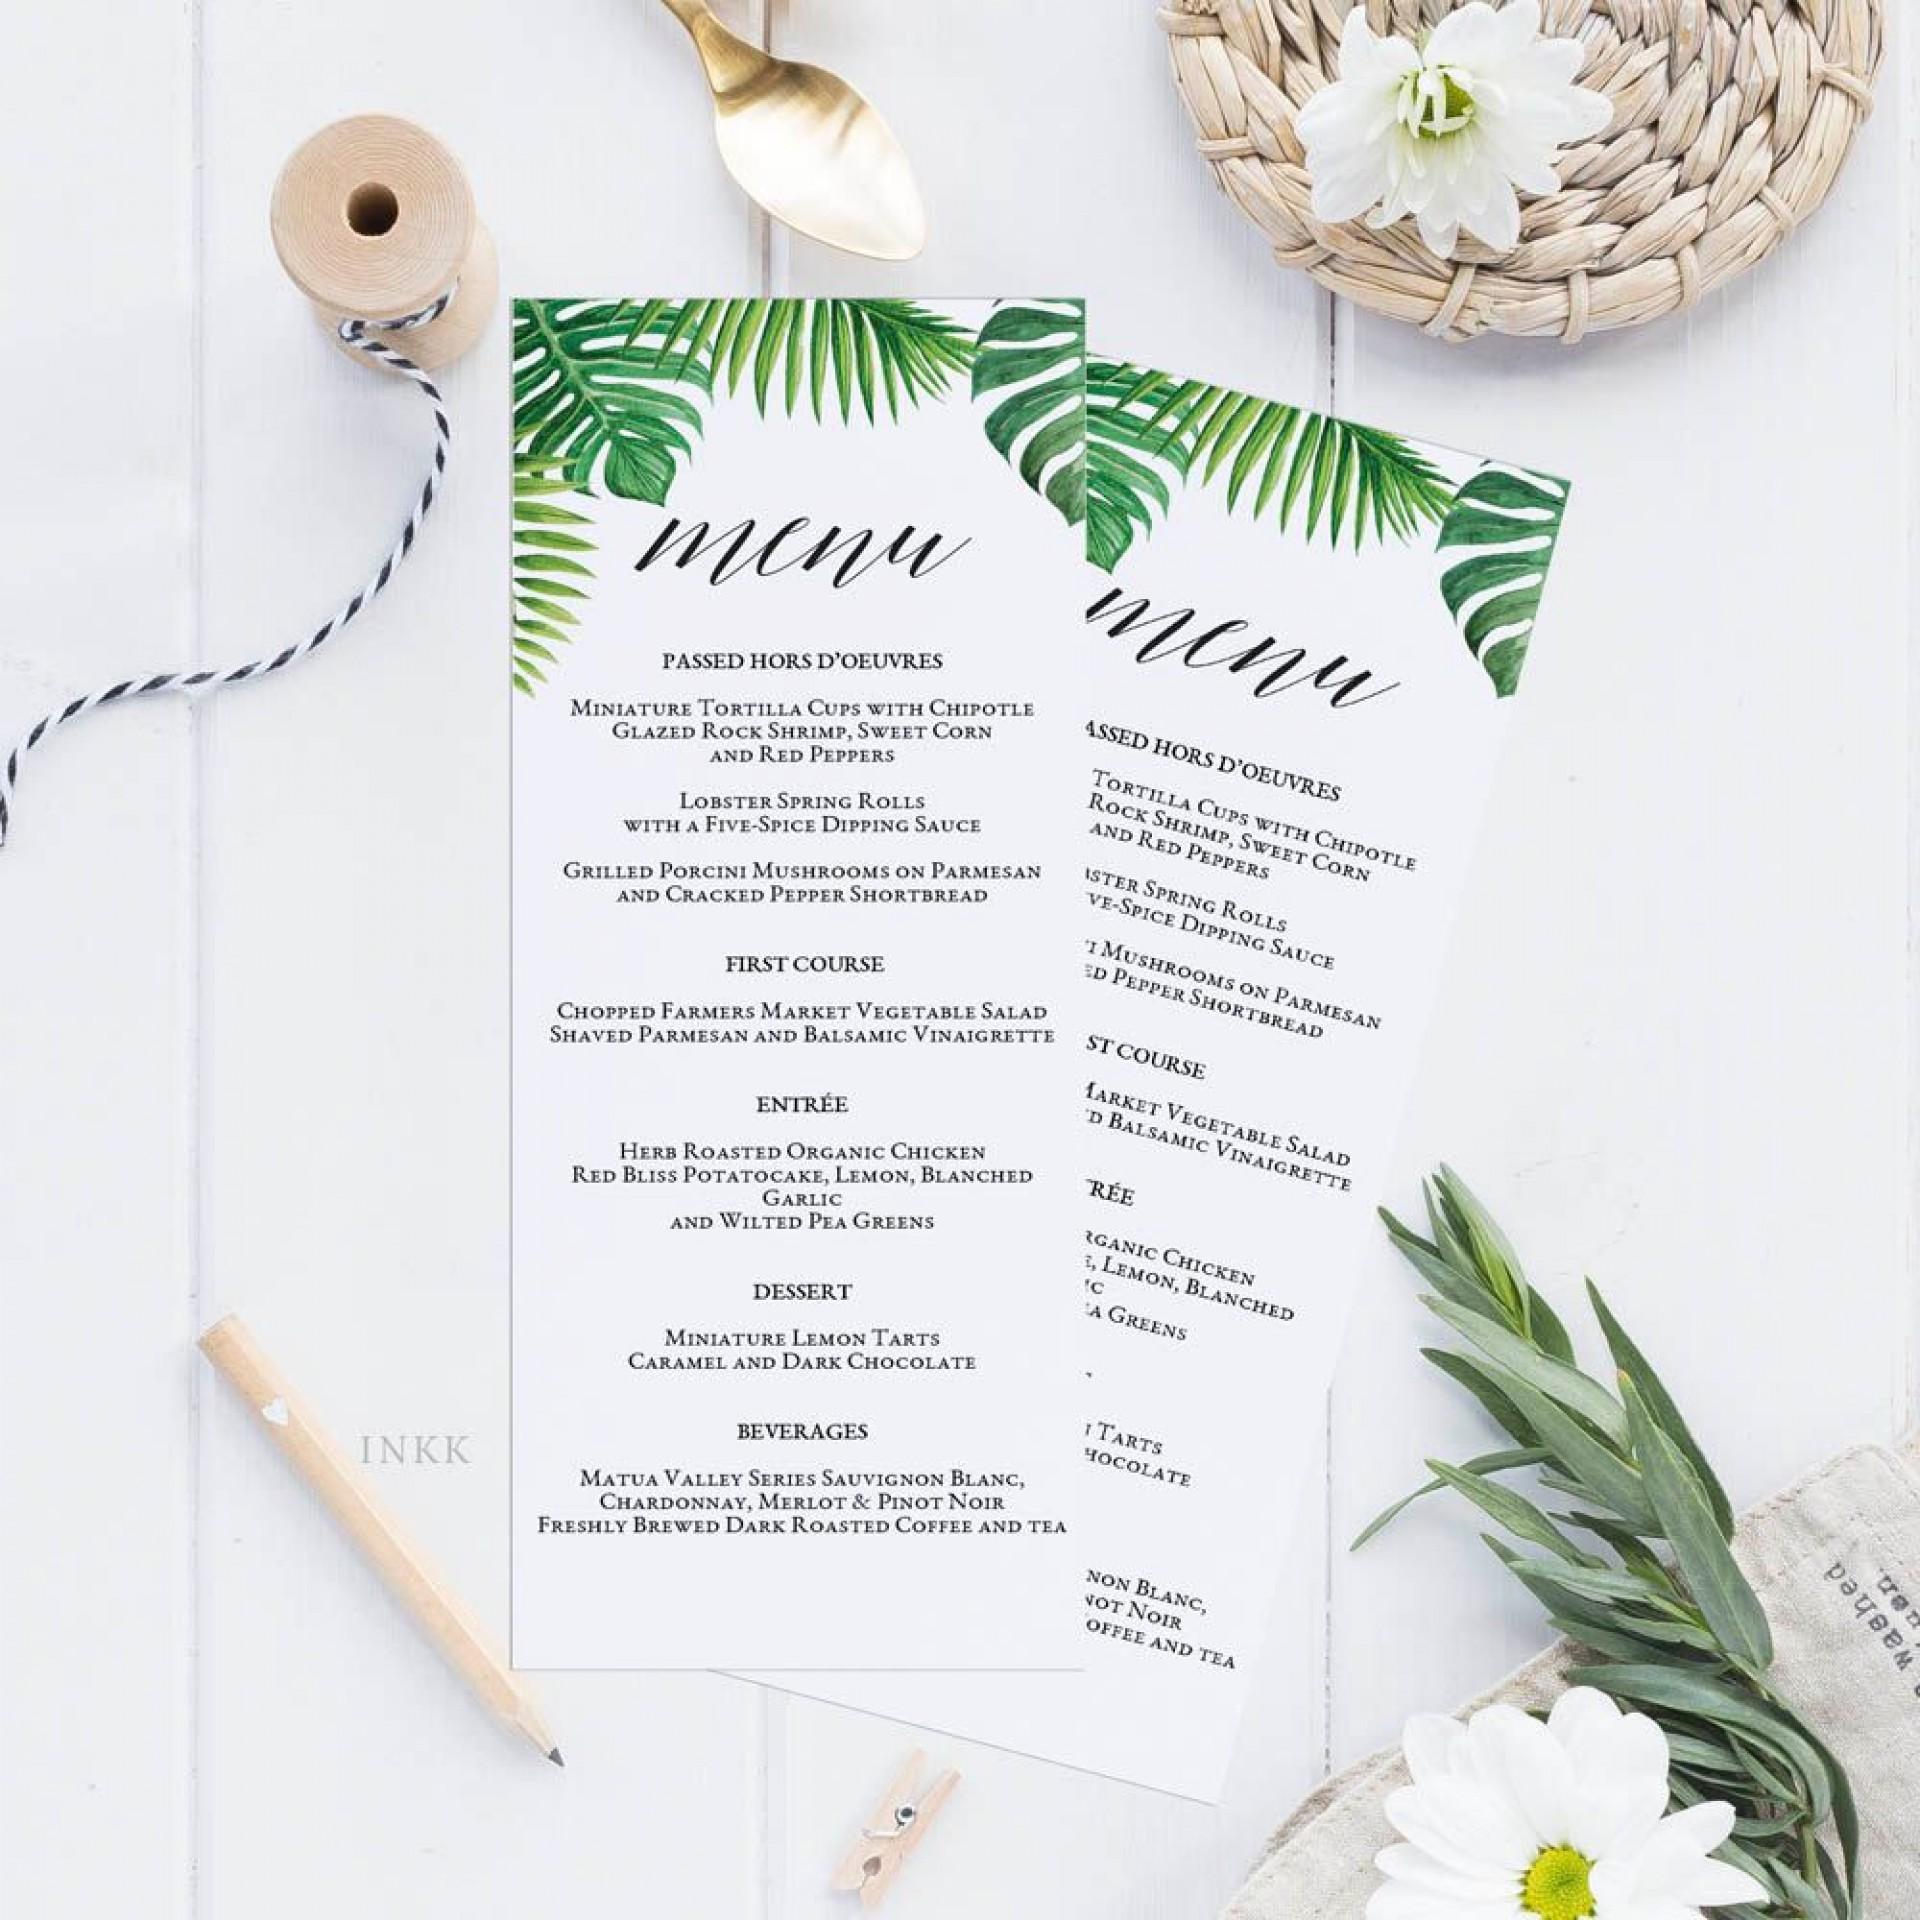 002 Top Free Printable Wedding Menu Card Template High Resolution  Templates1920